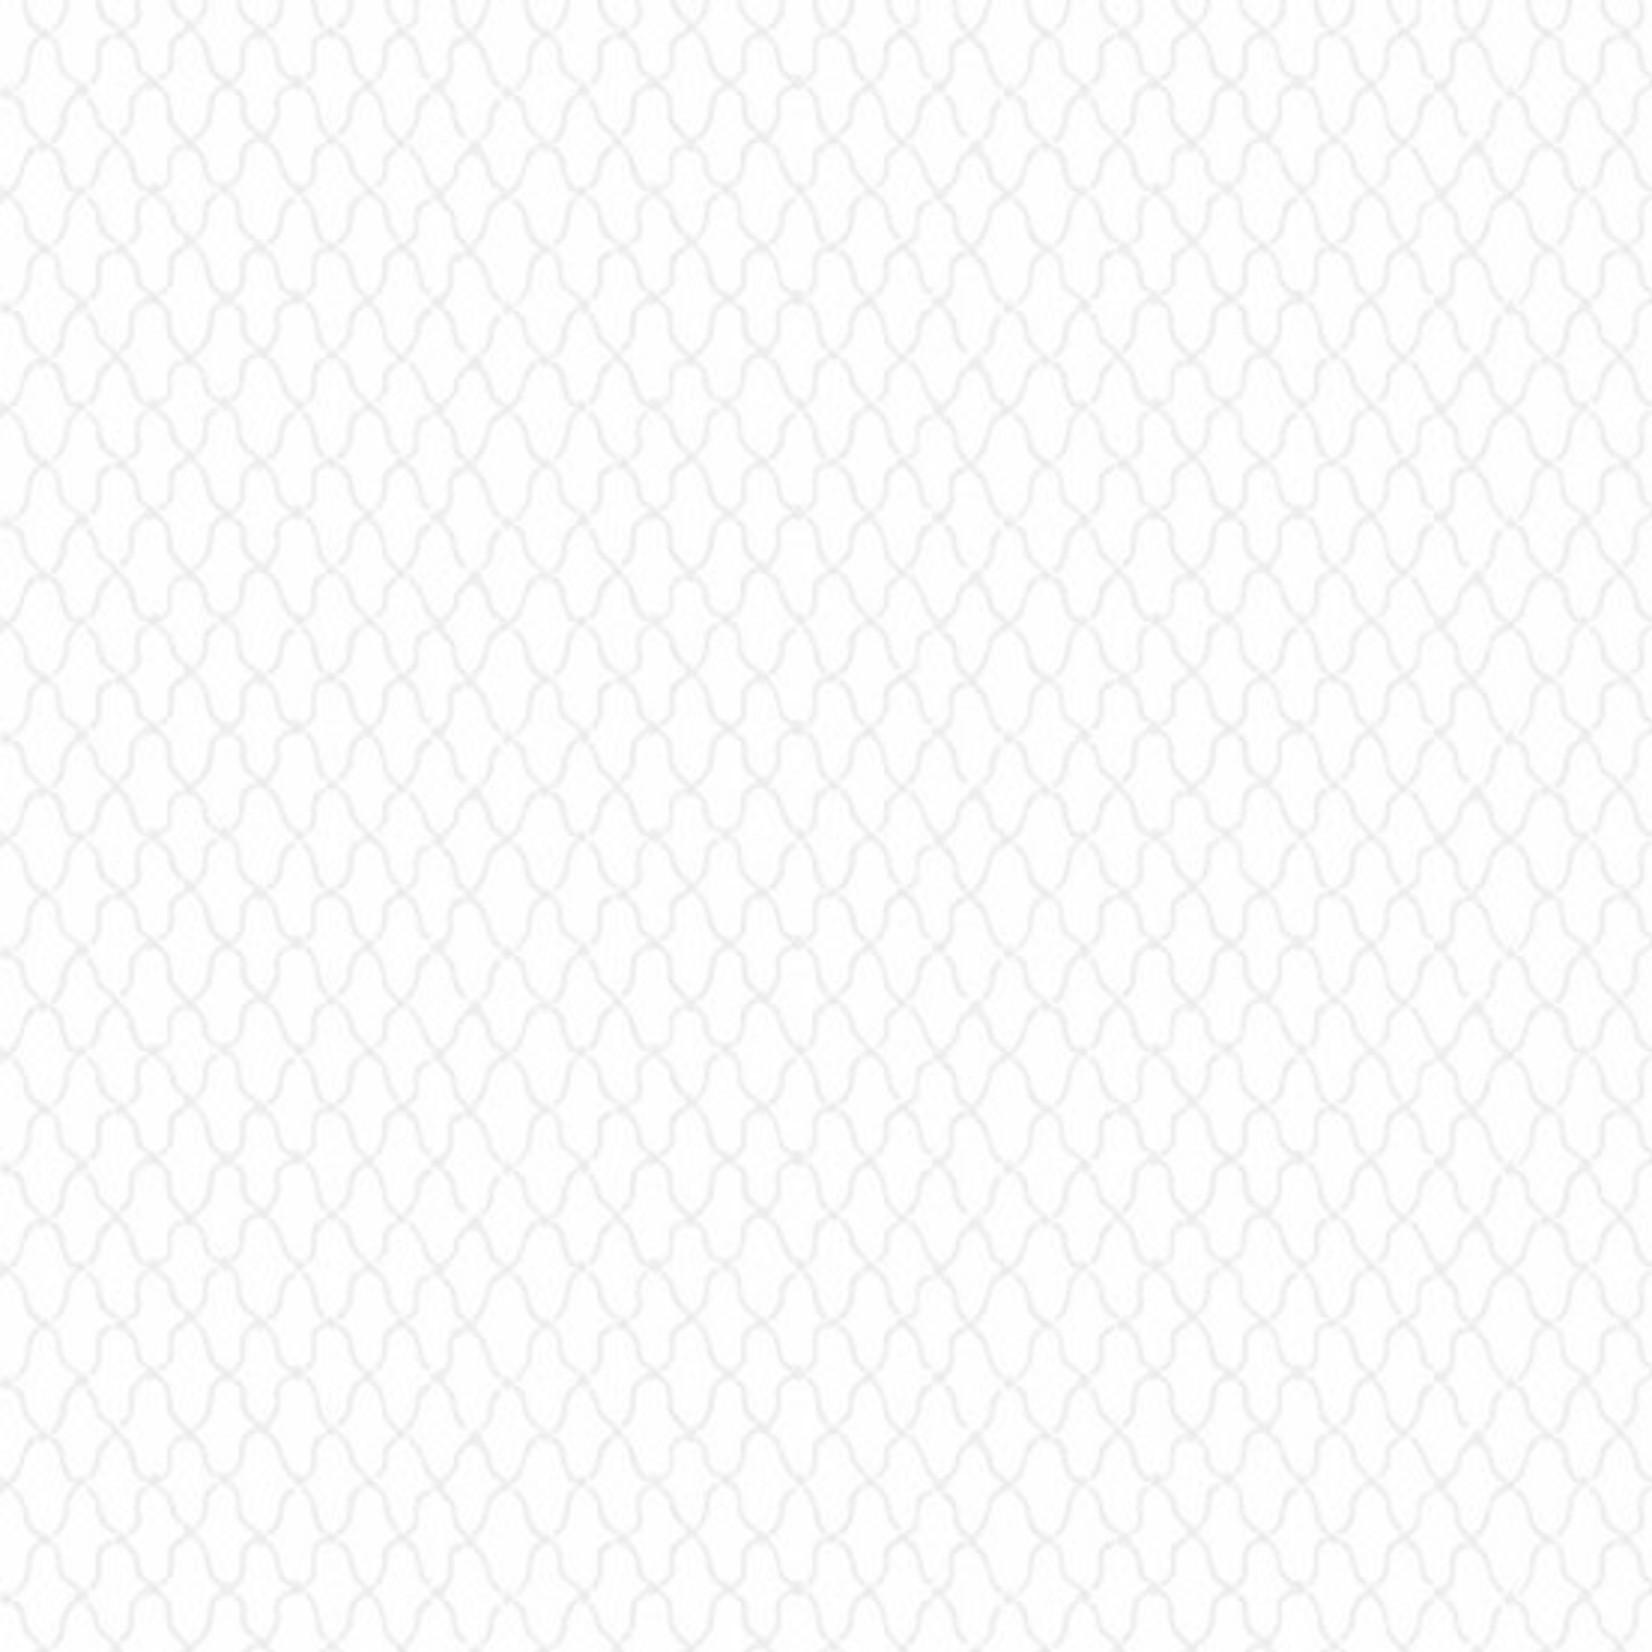 Andover Century Whites, Macrame CS-9690-WW $0.18 per cm or $18/m